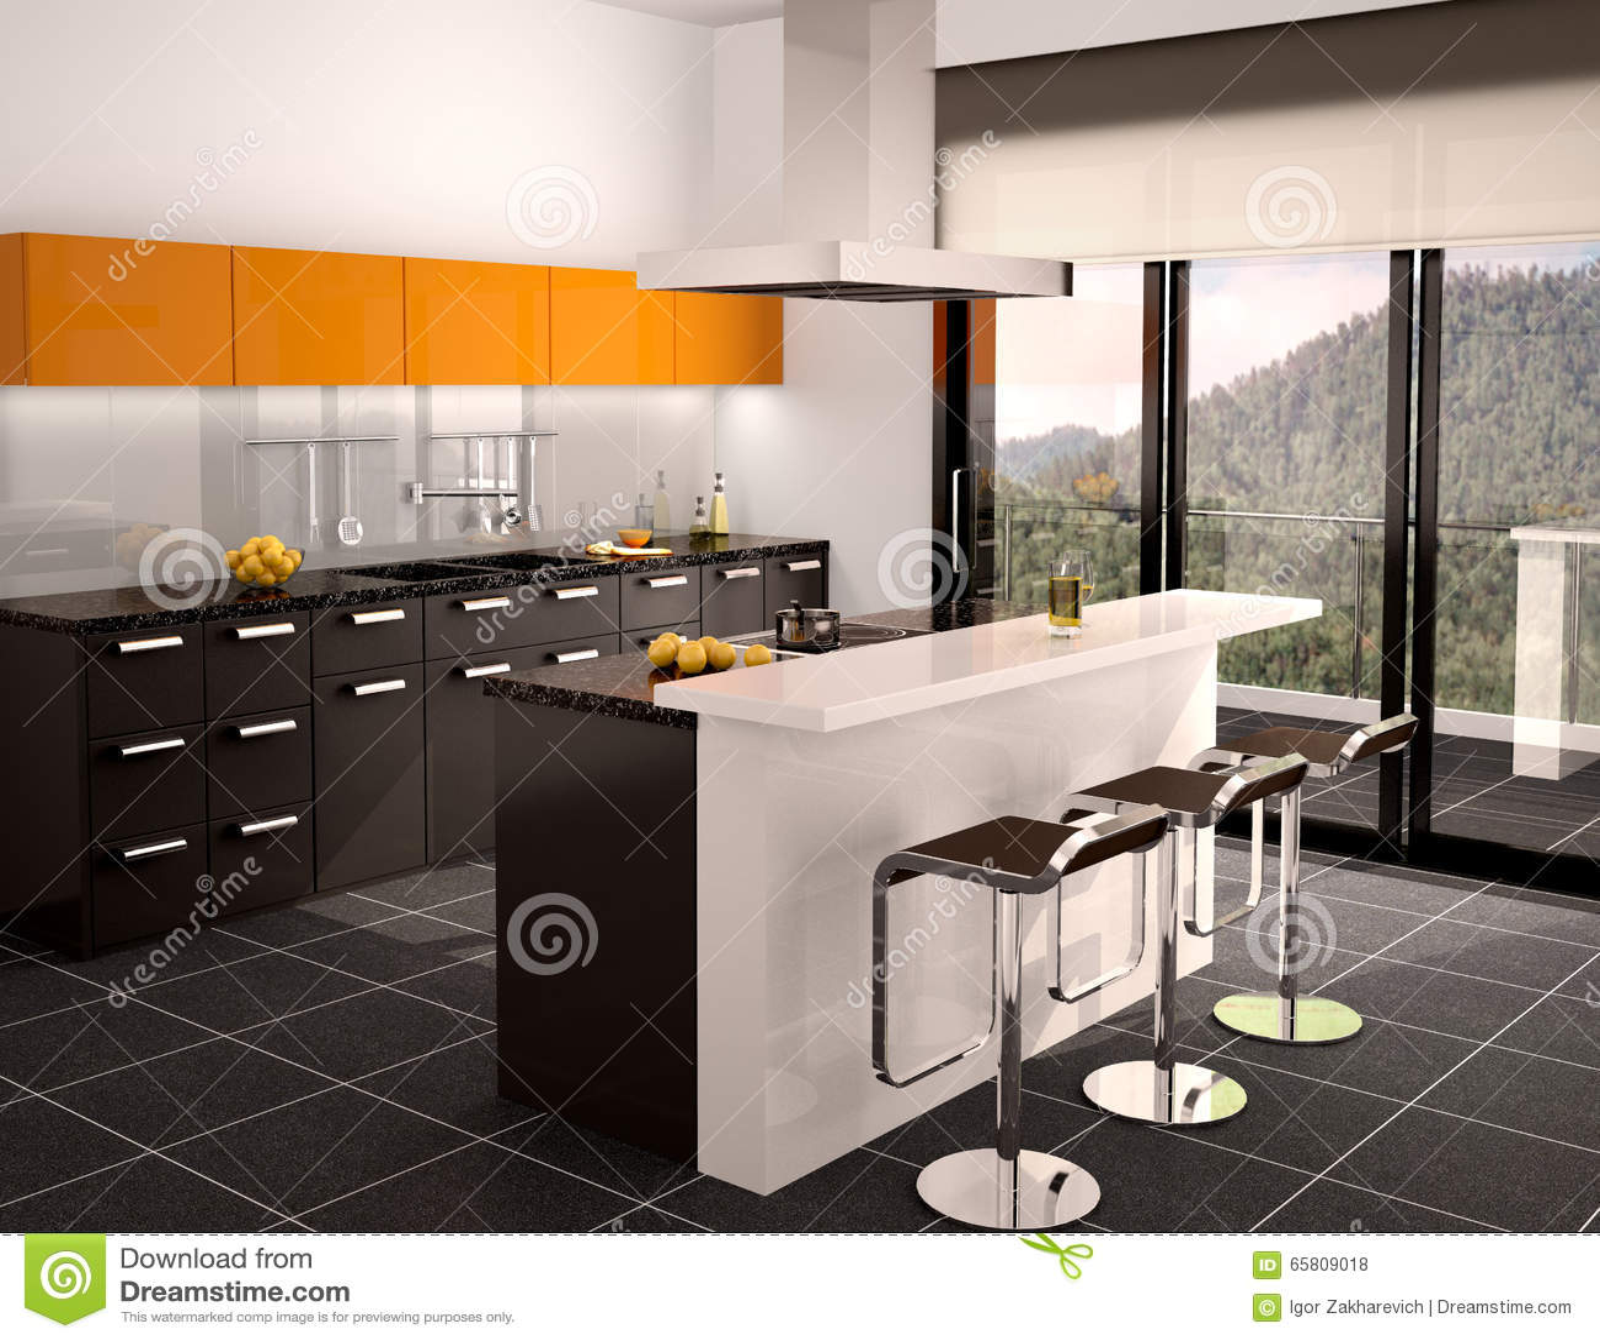 Illustration Of Modern Black And Orange Stock Illustration